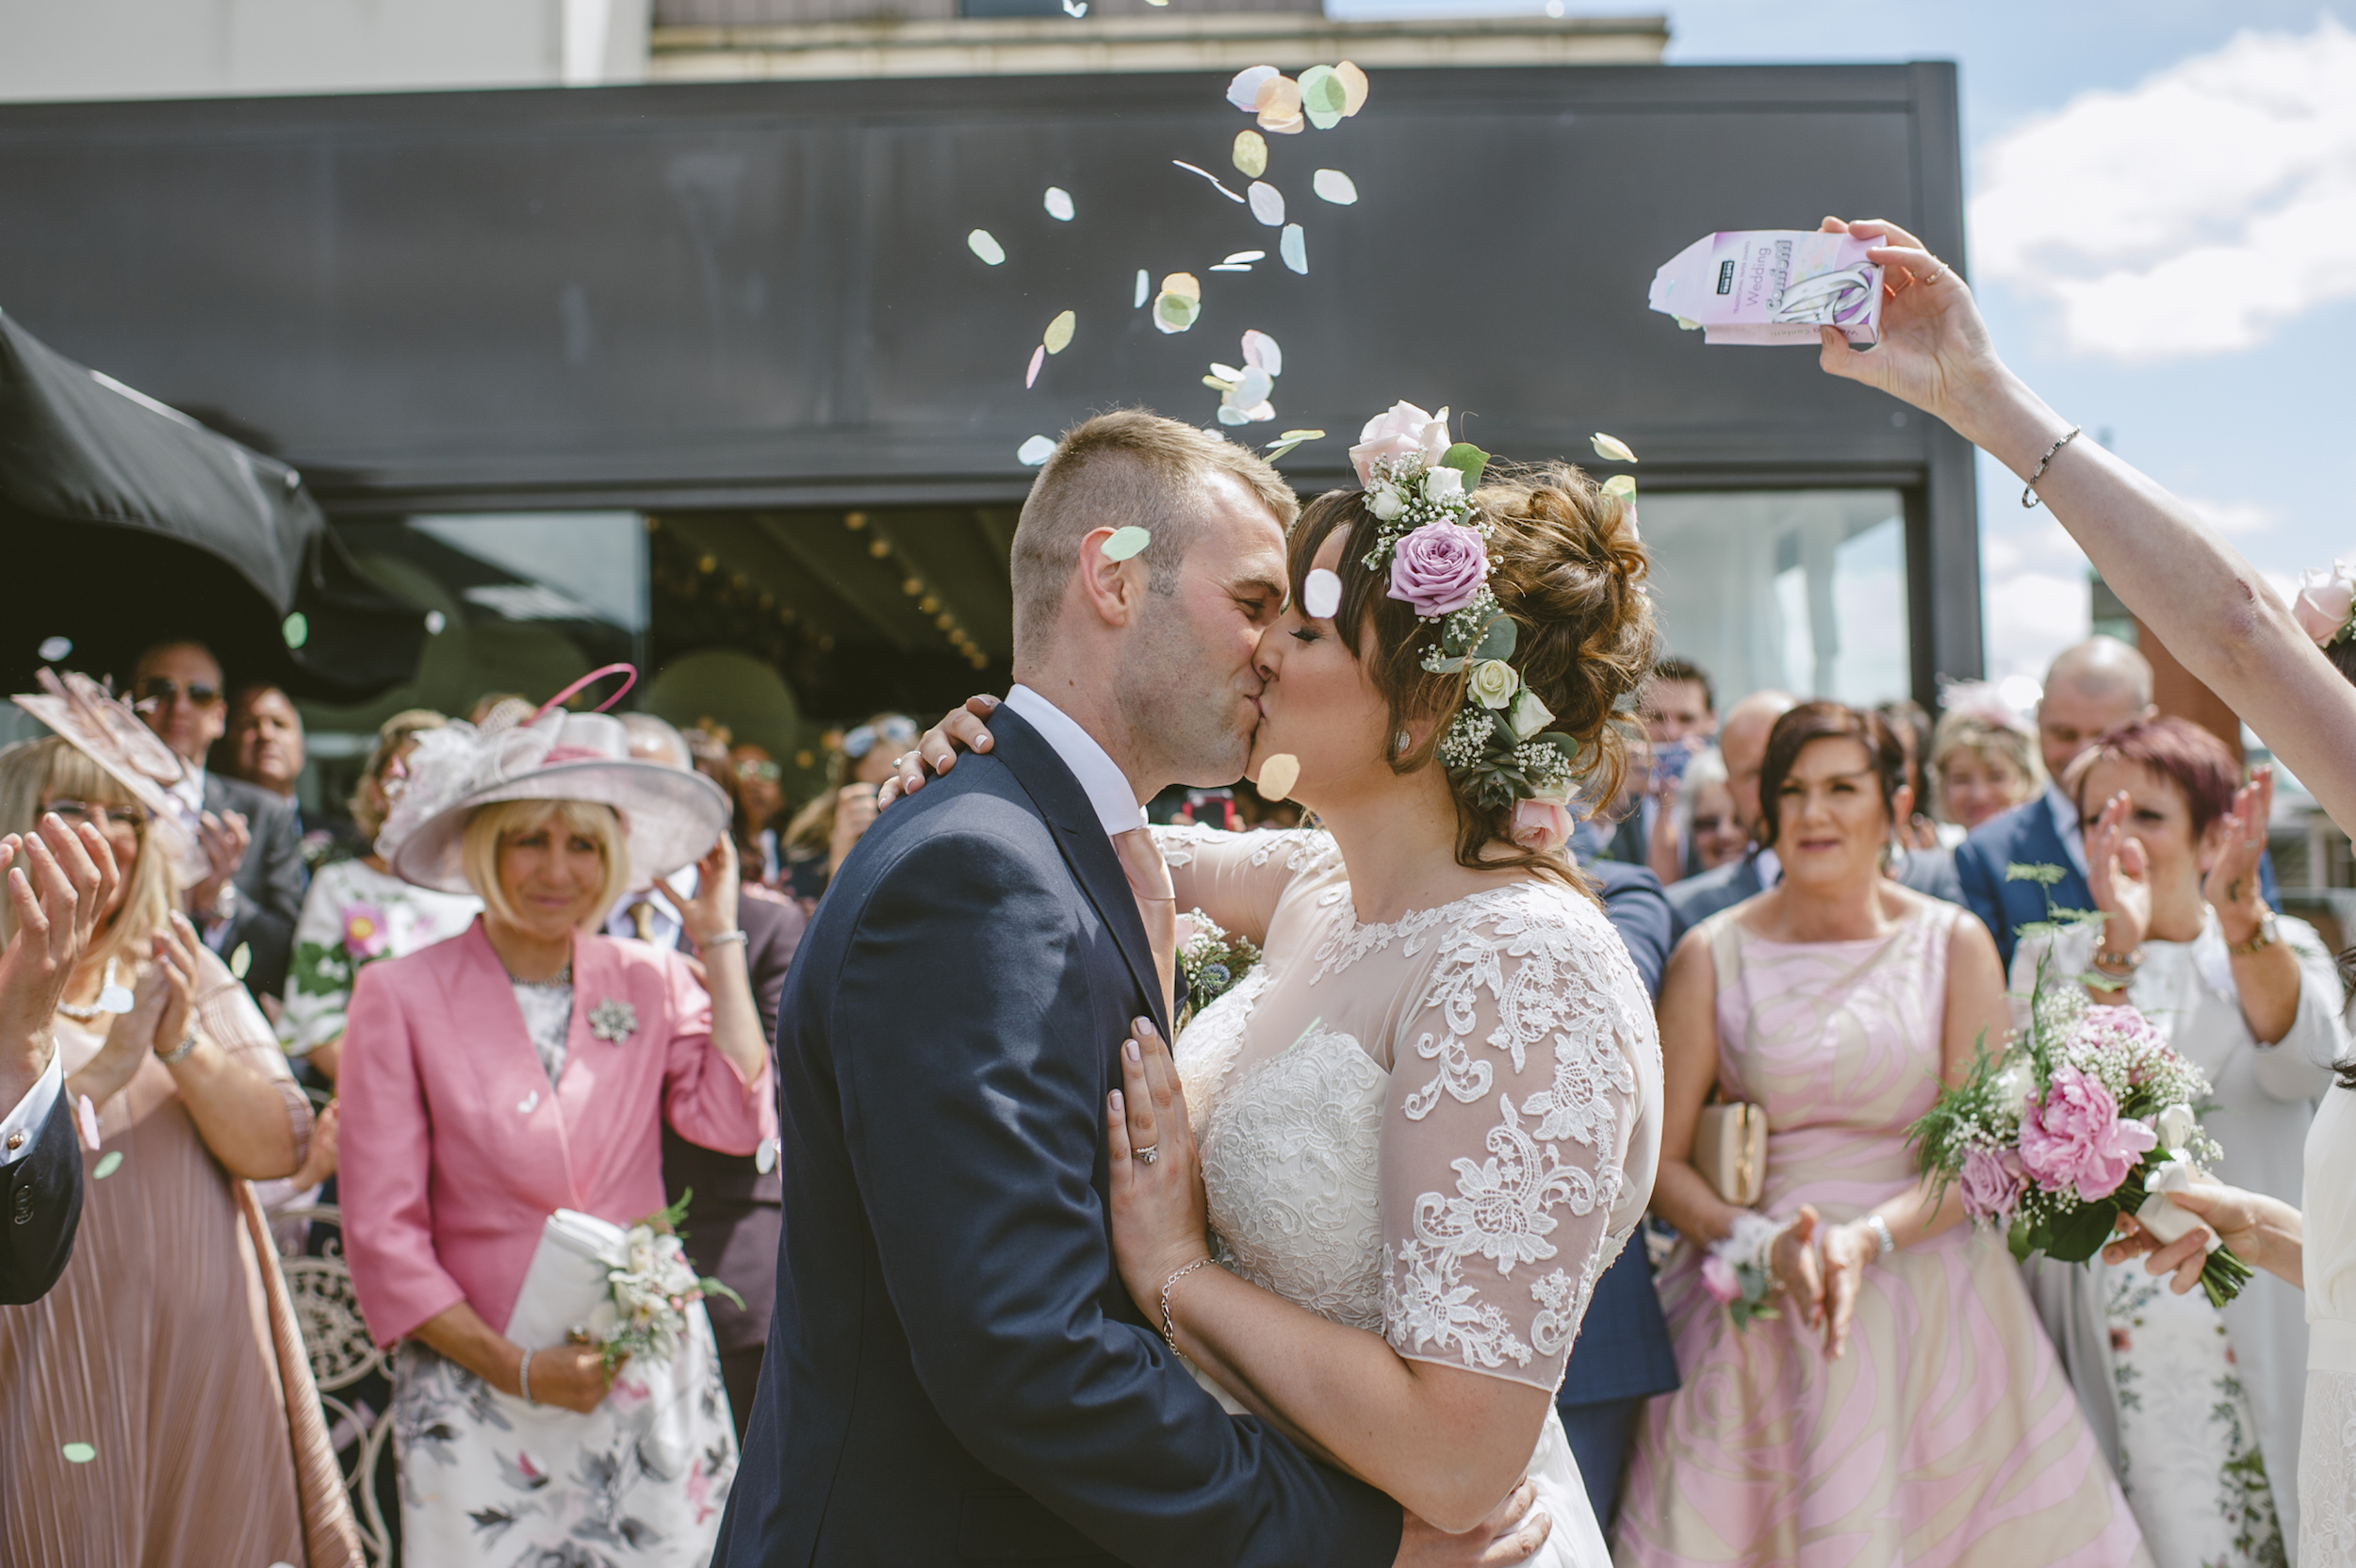 Francis_meaney_photography_merchant_hotel_wedding_belfast_inspire_weddings_3.jpeg